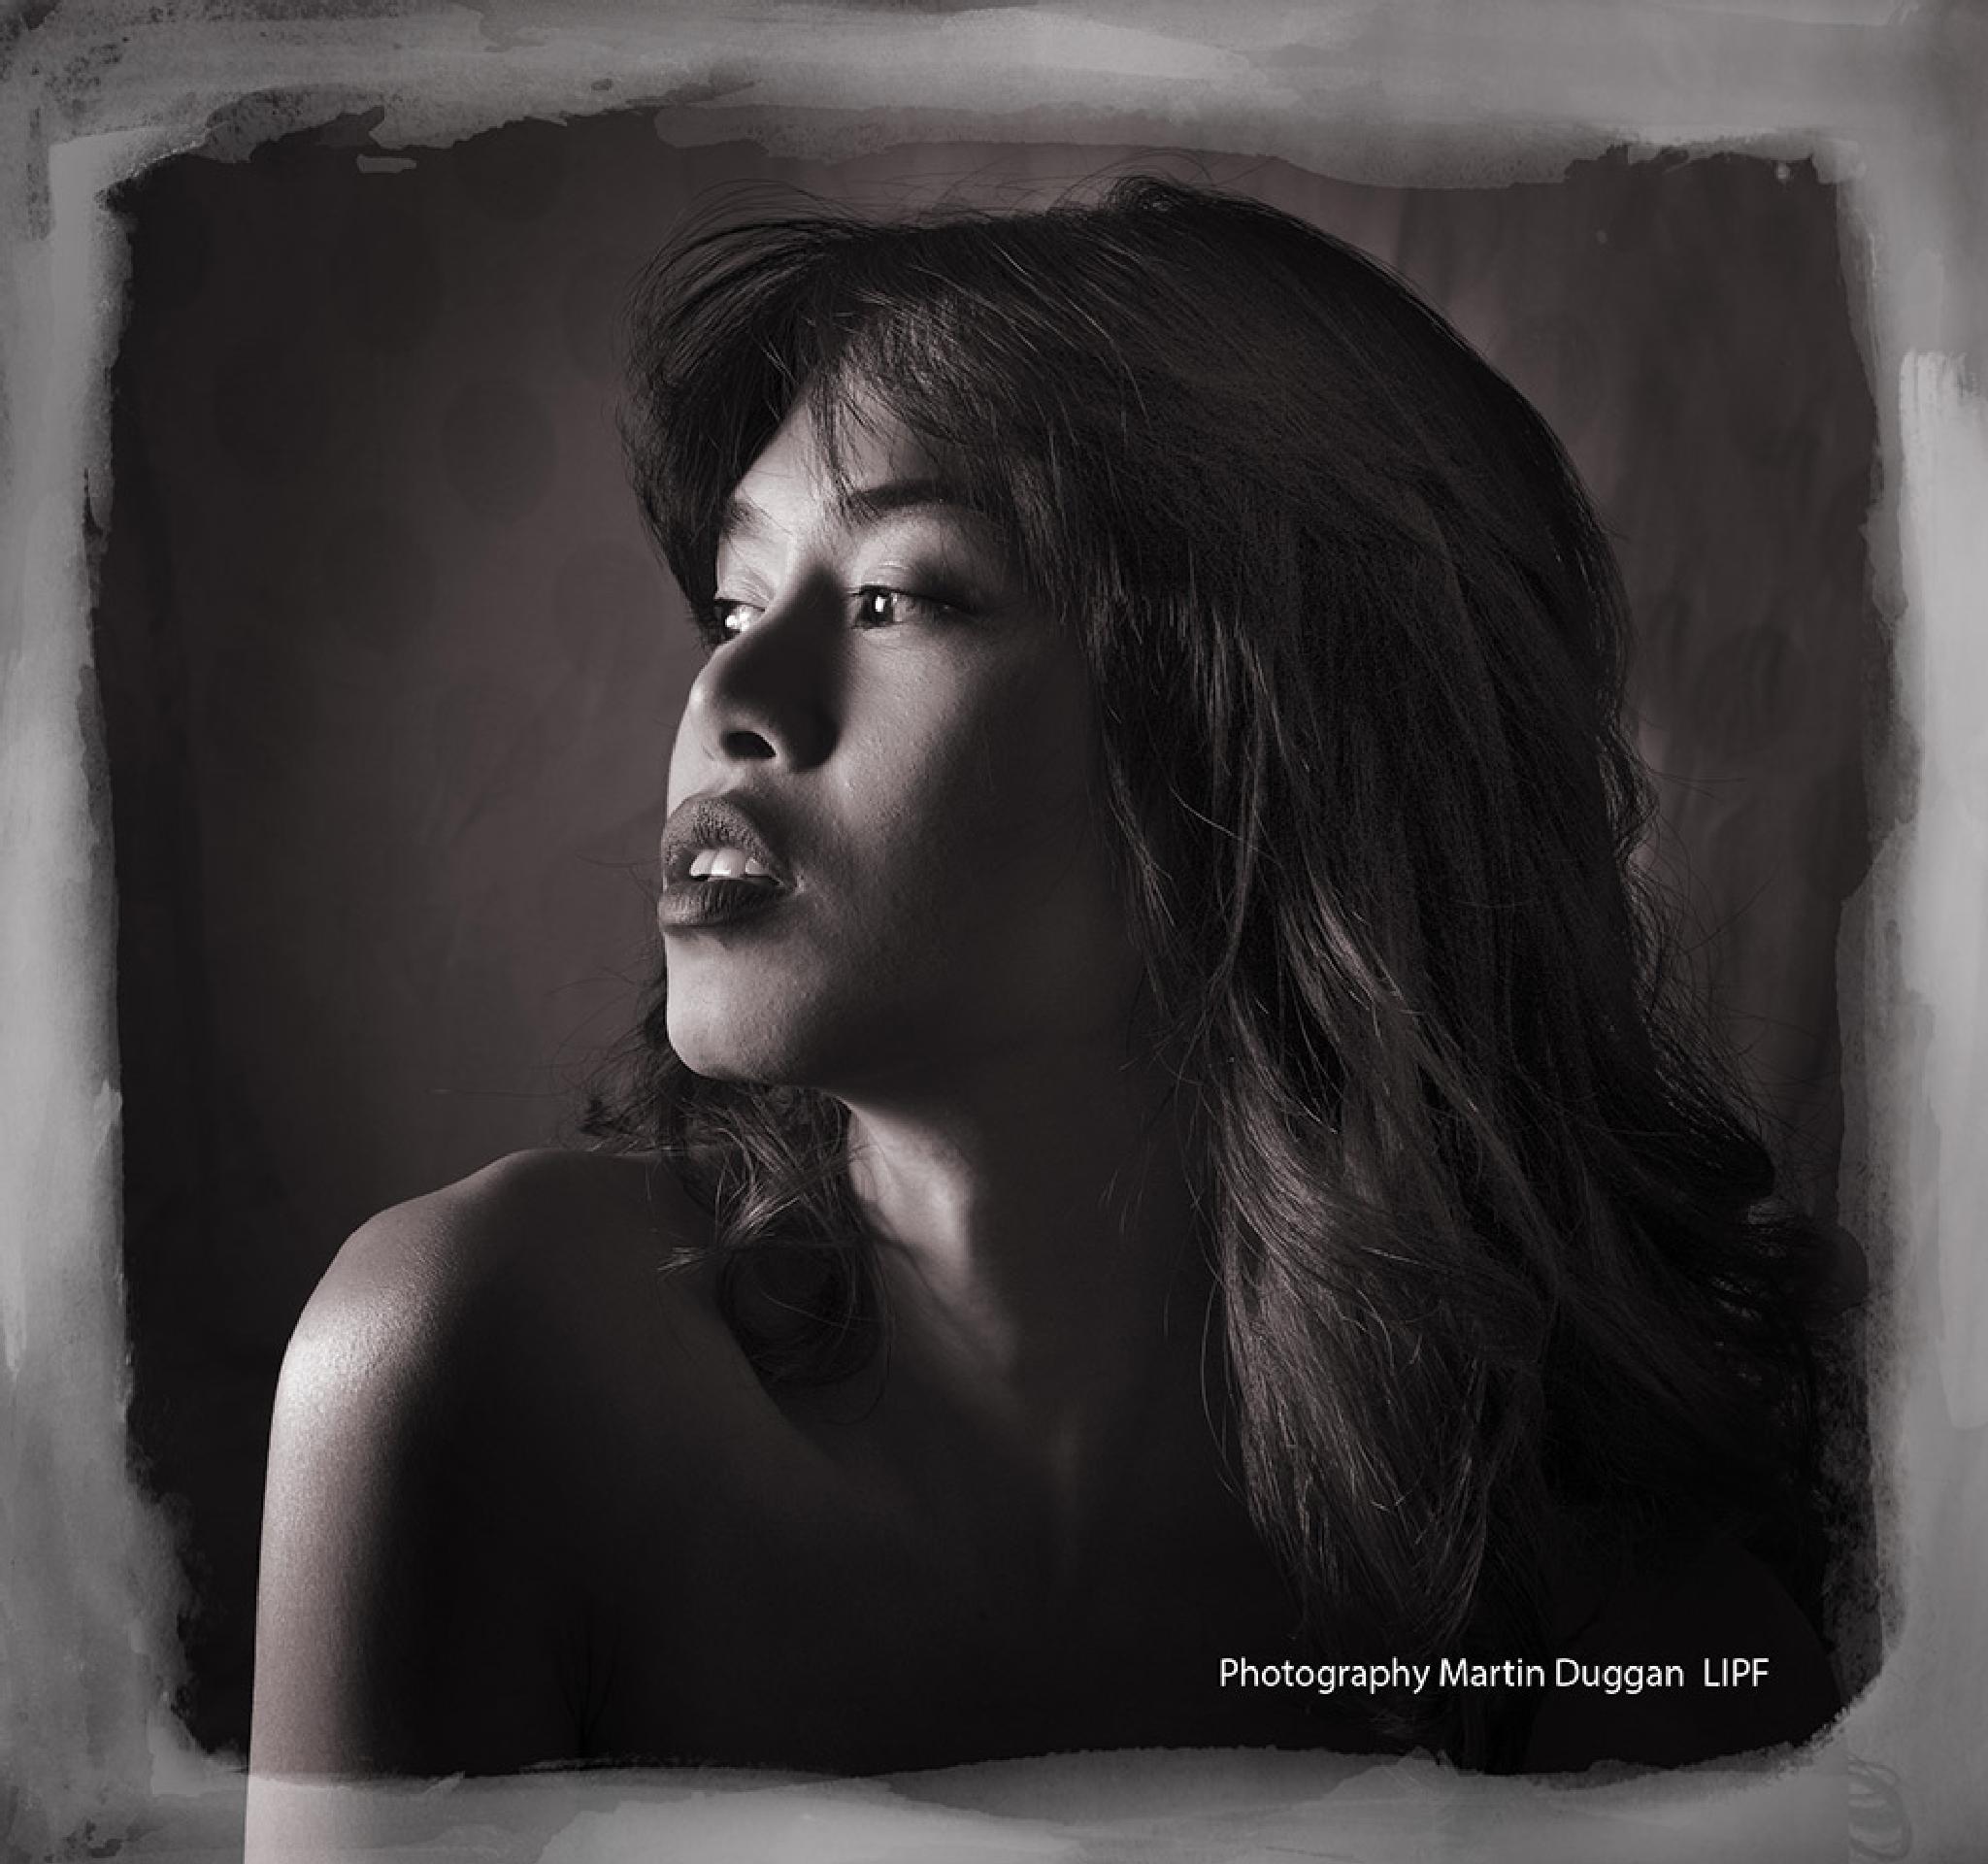 Model Shoot by dugganshandon